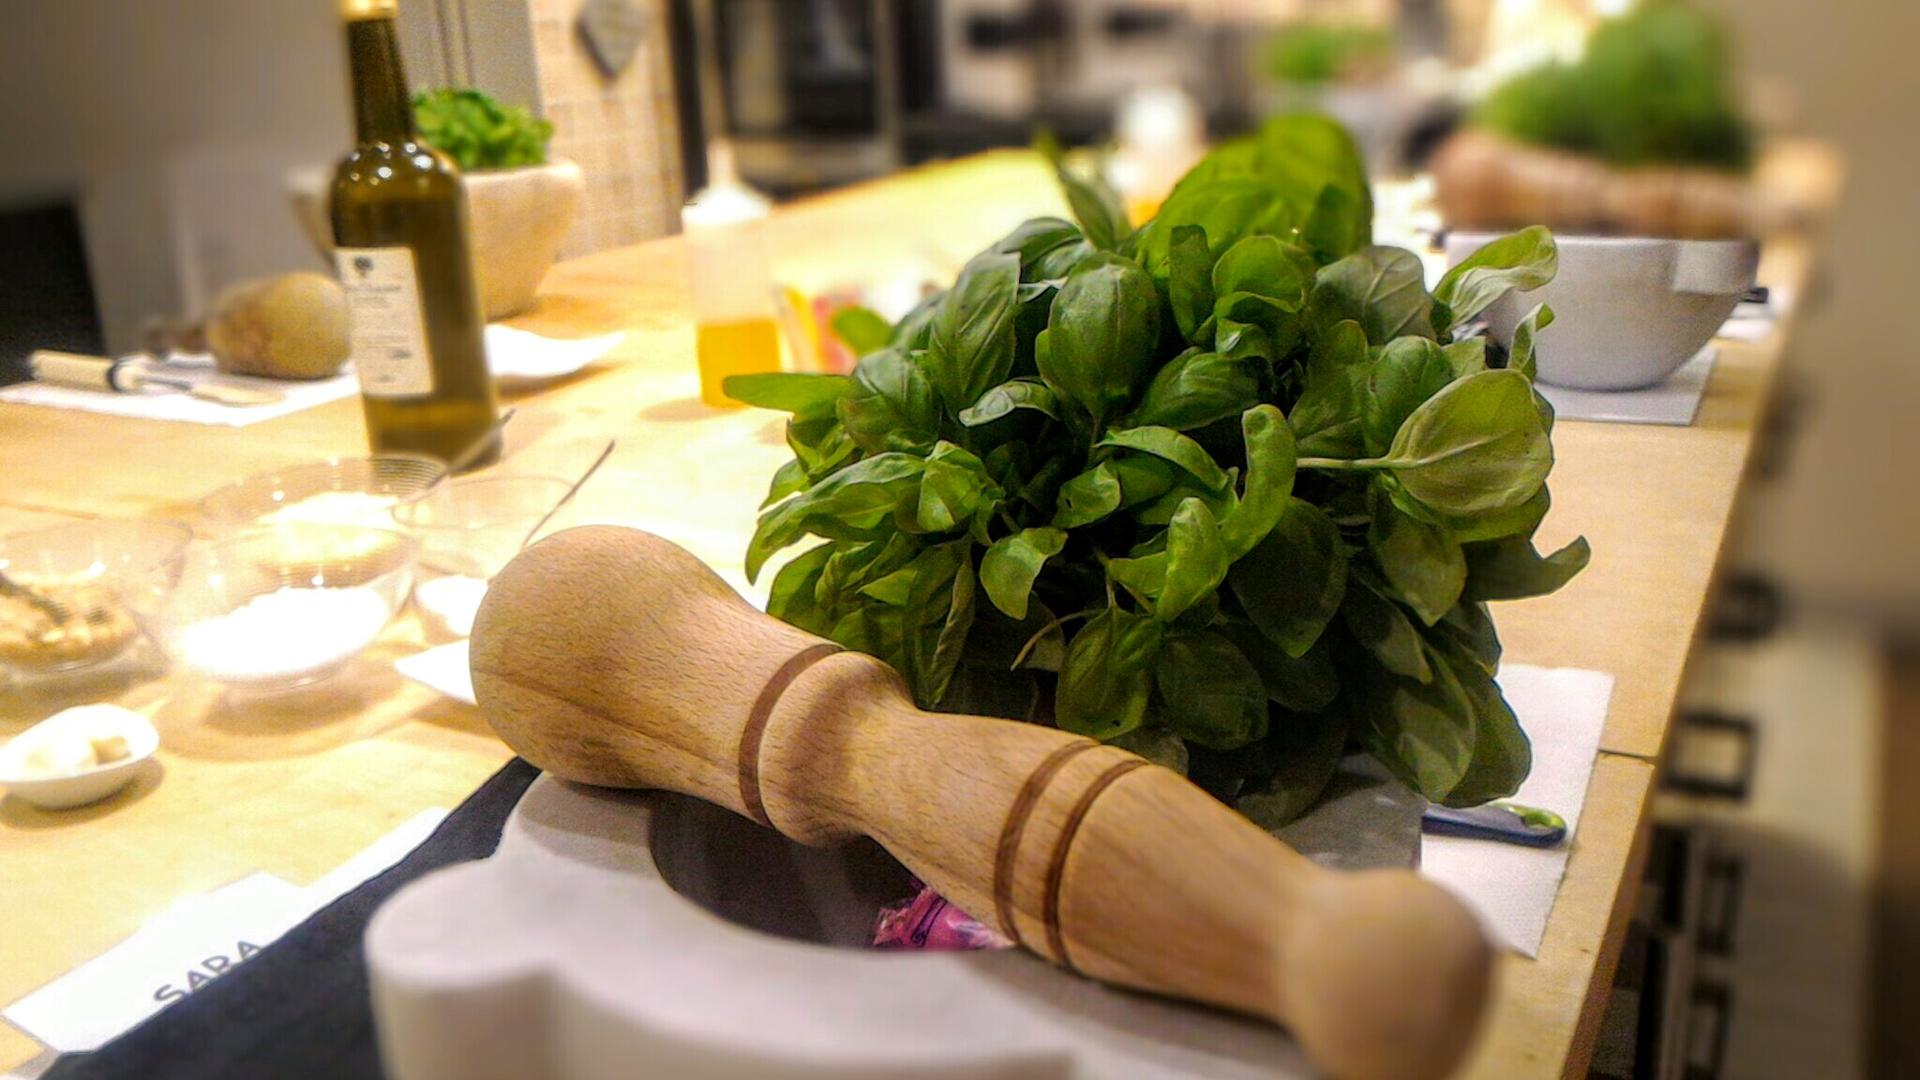 Profumo di basilico zenandcook - Corsi di cucina genova ...